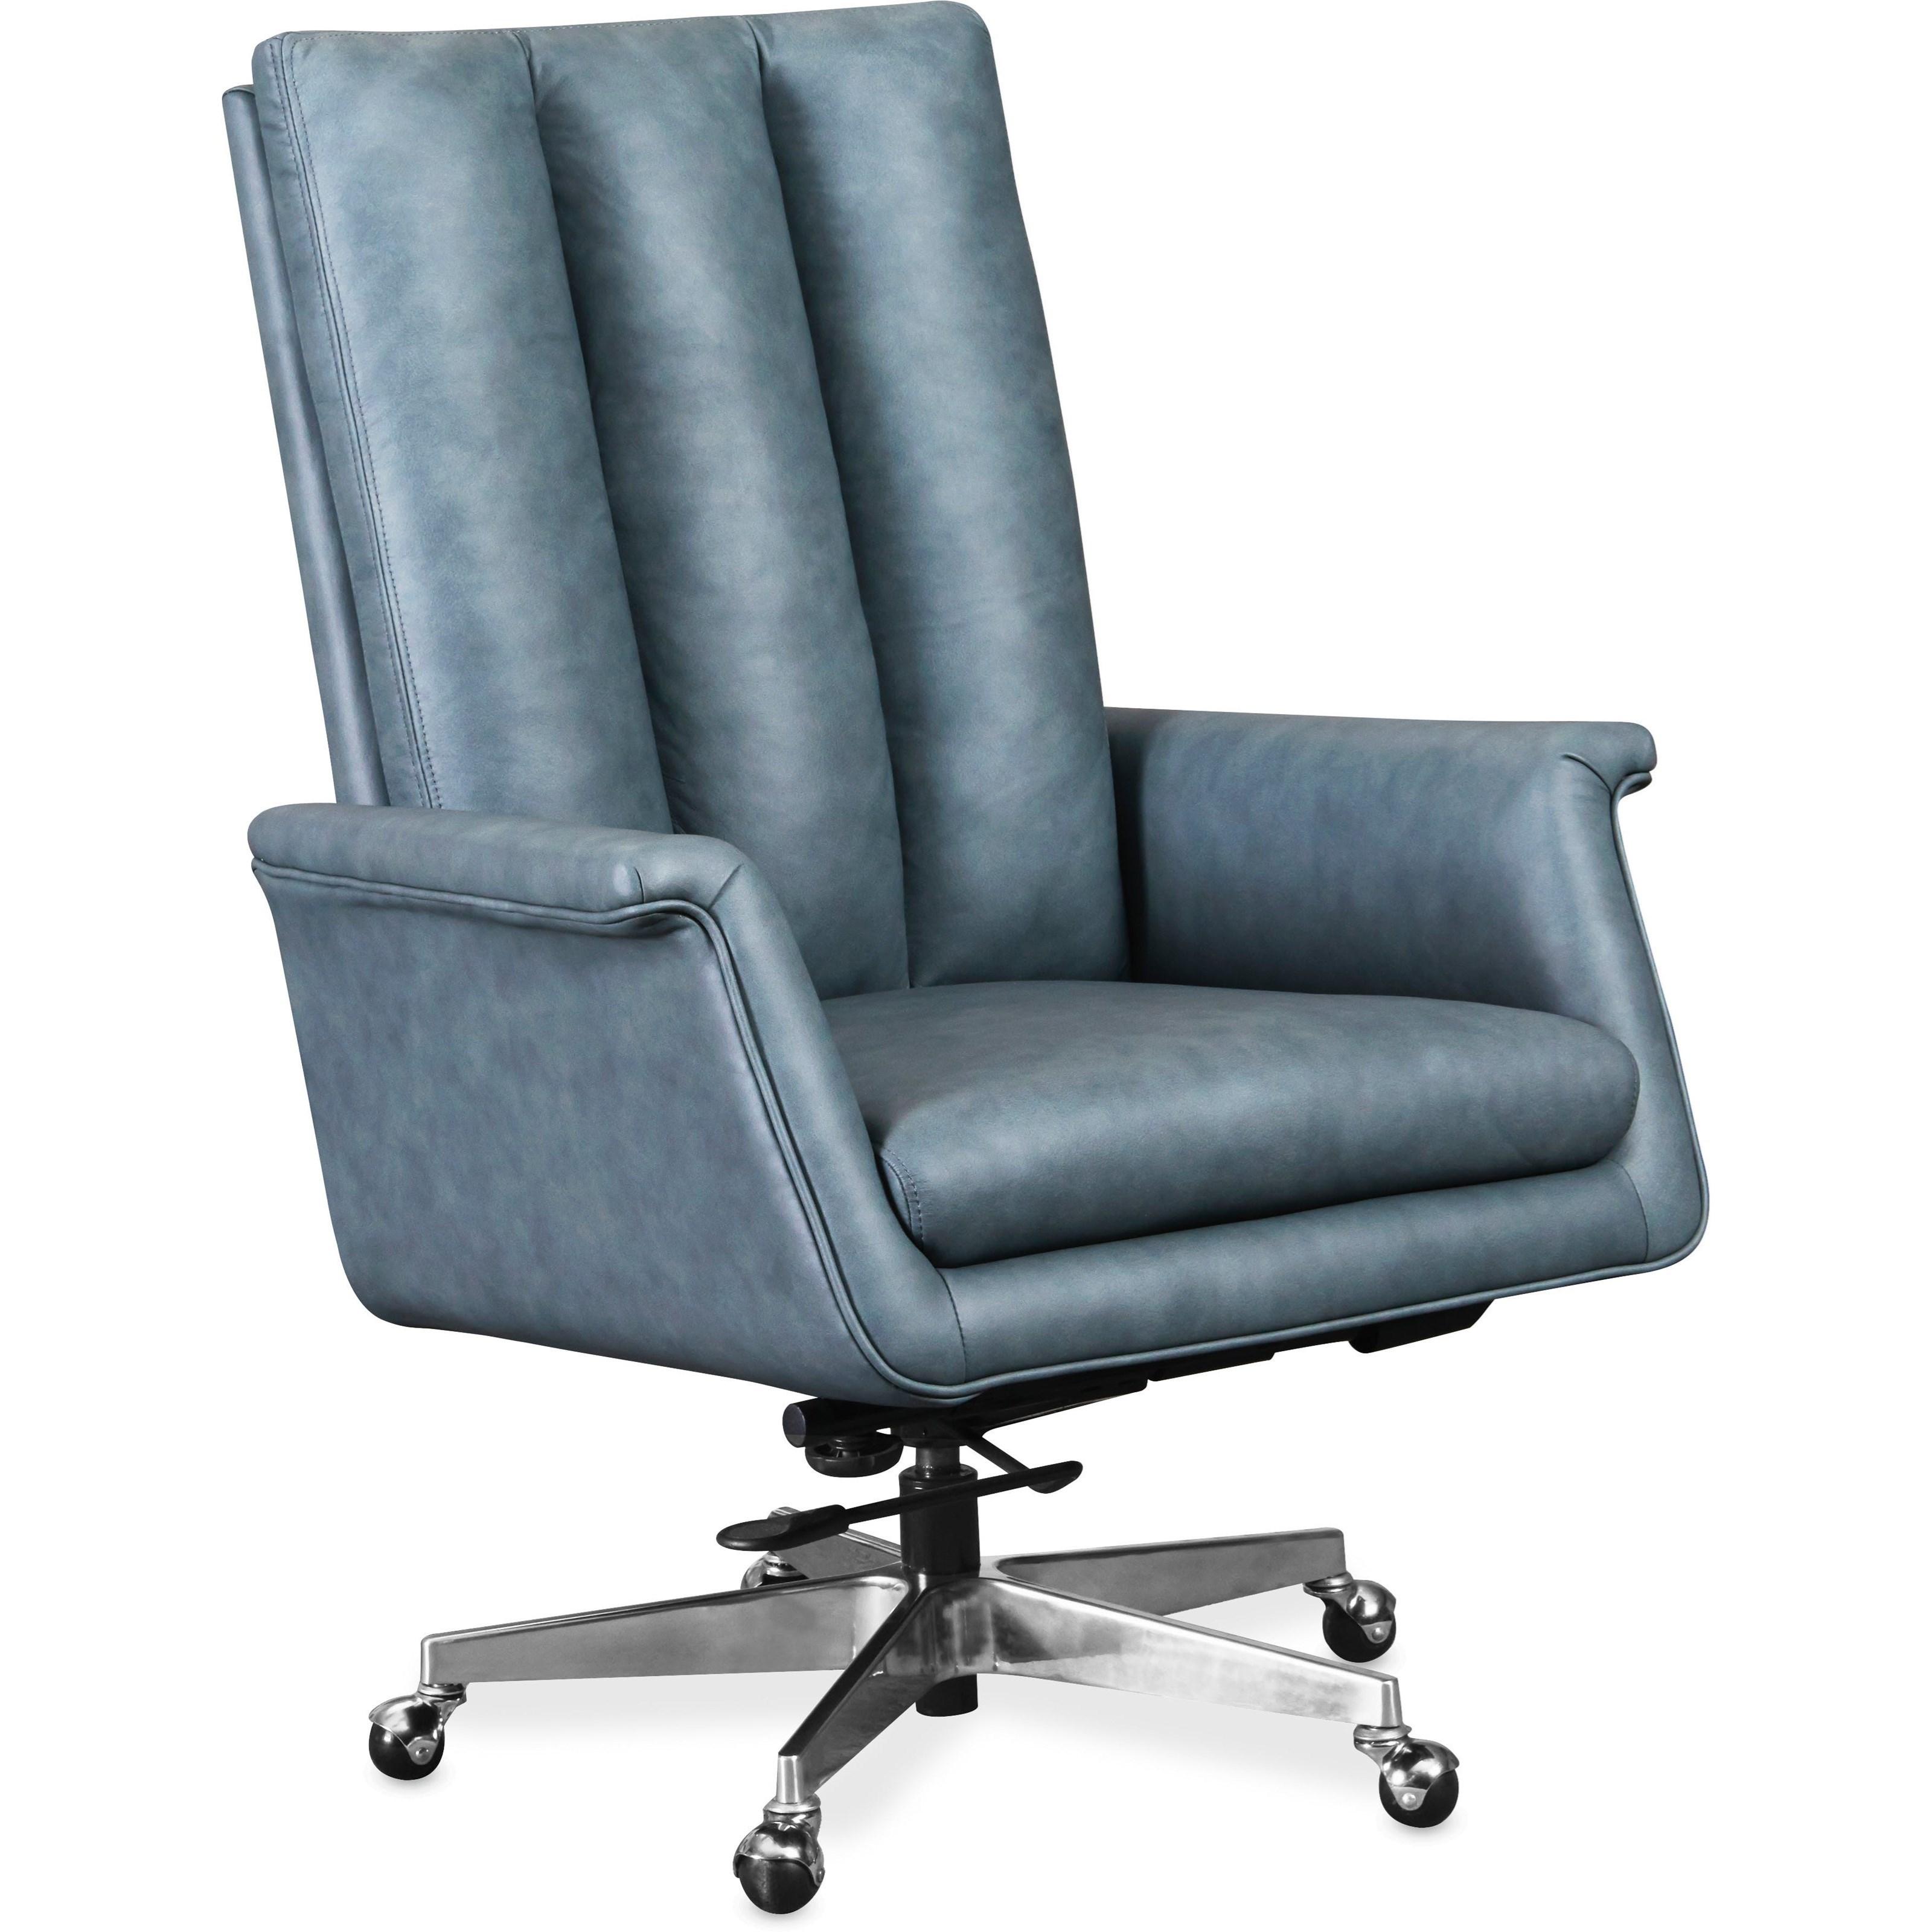 Executive Seating Executive Swivel Tilt Chair